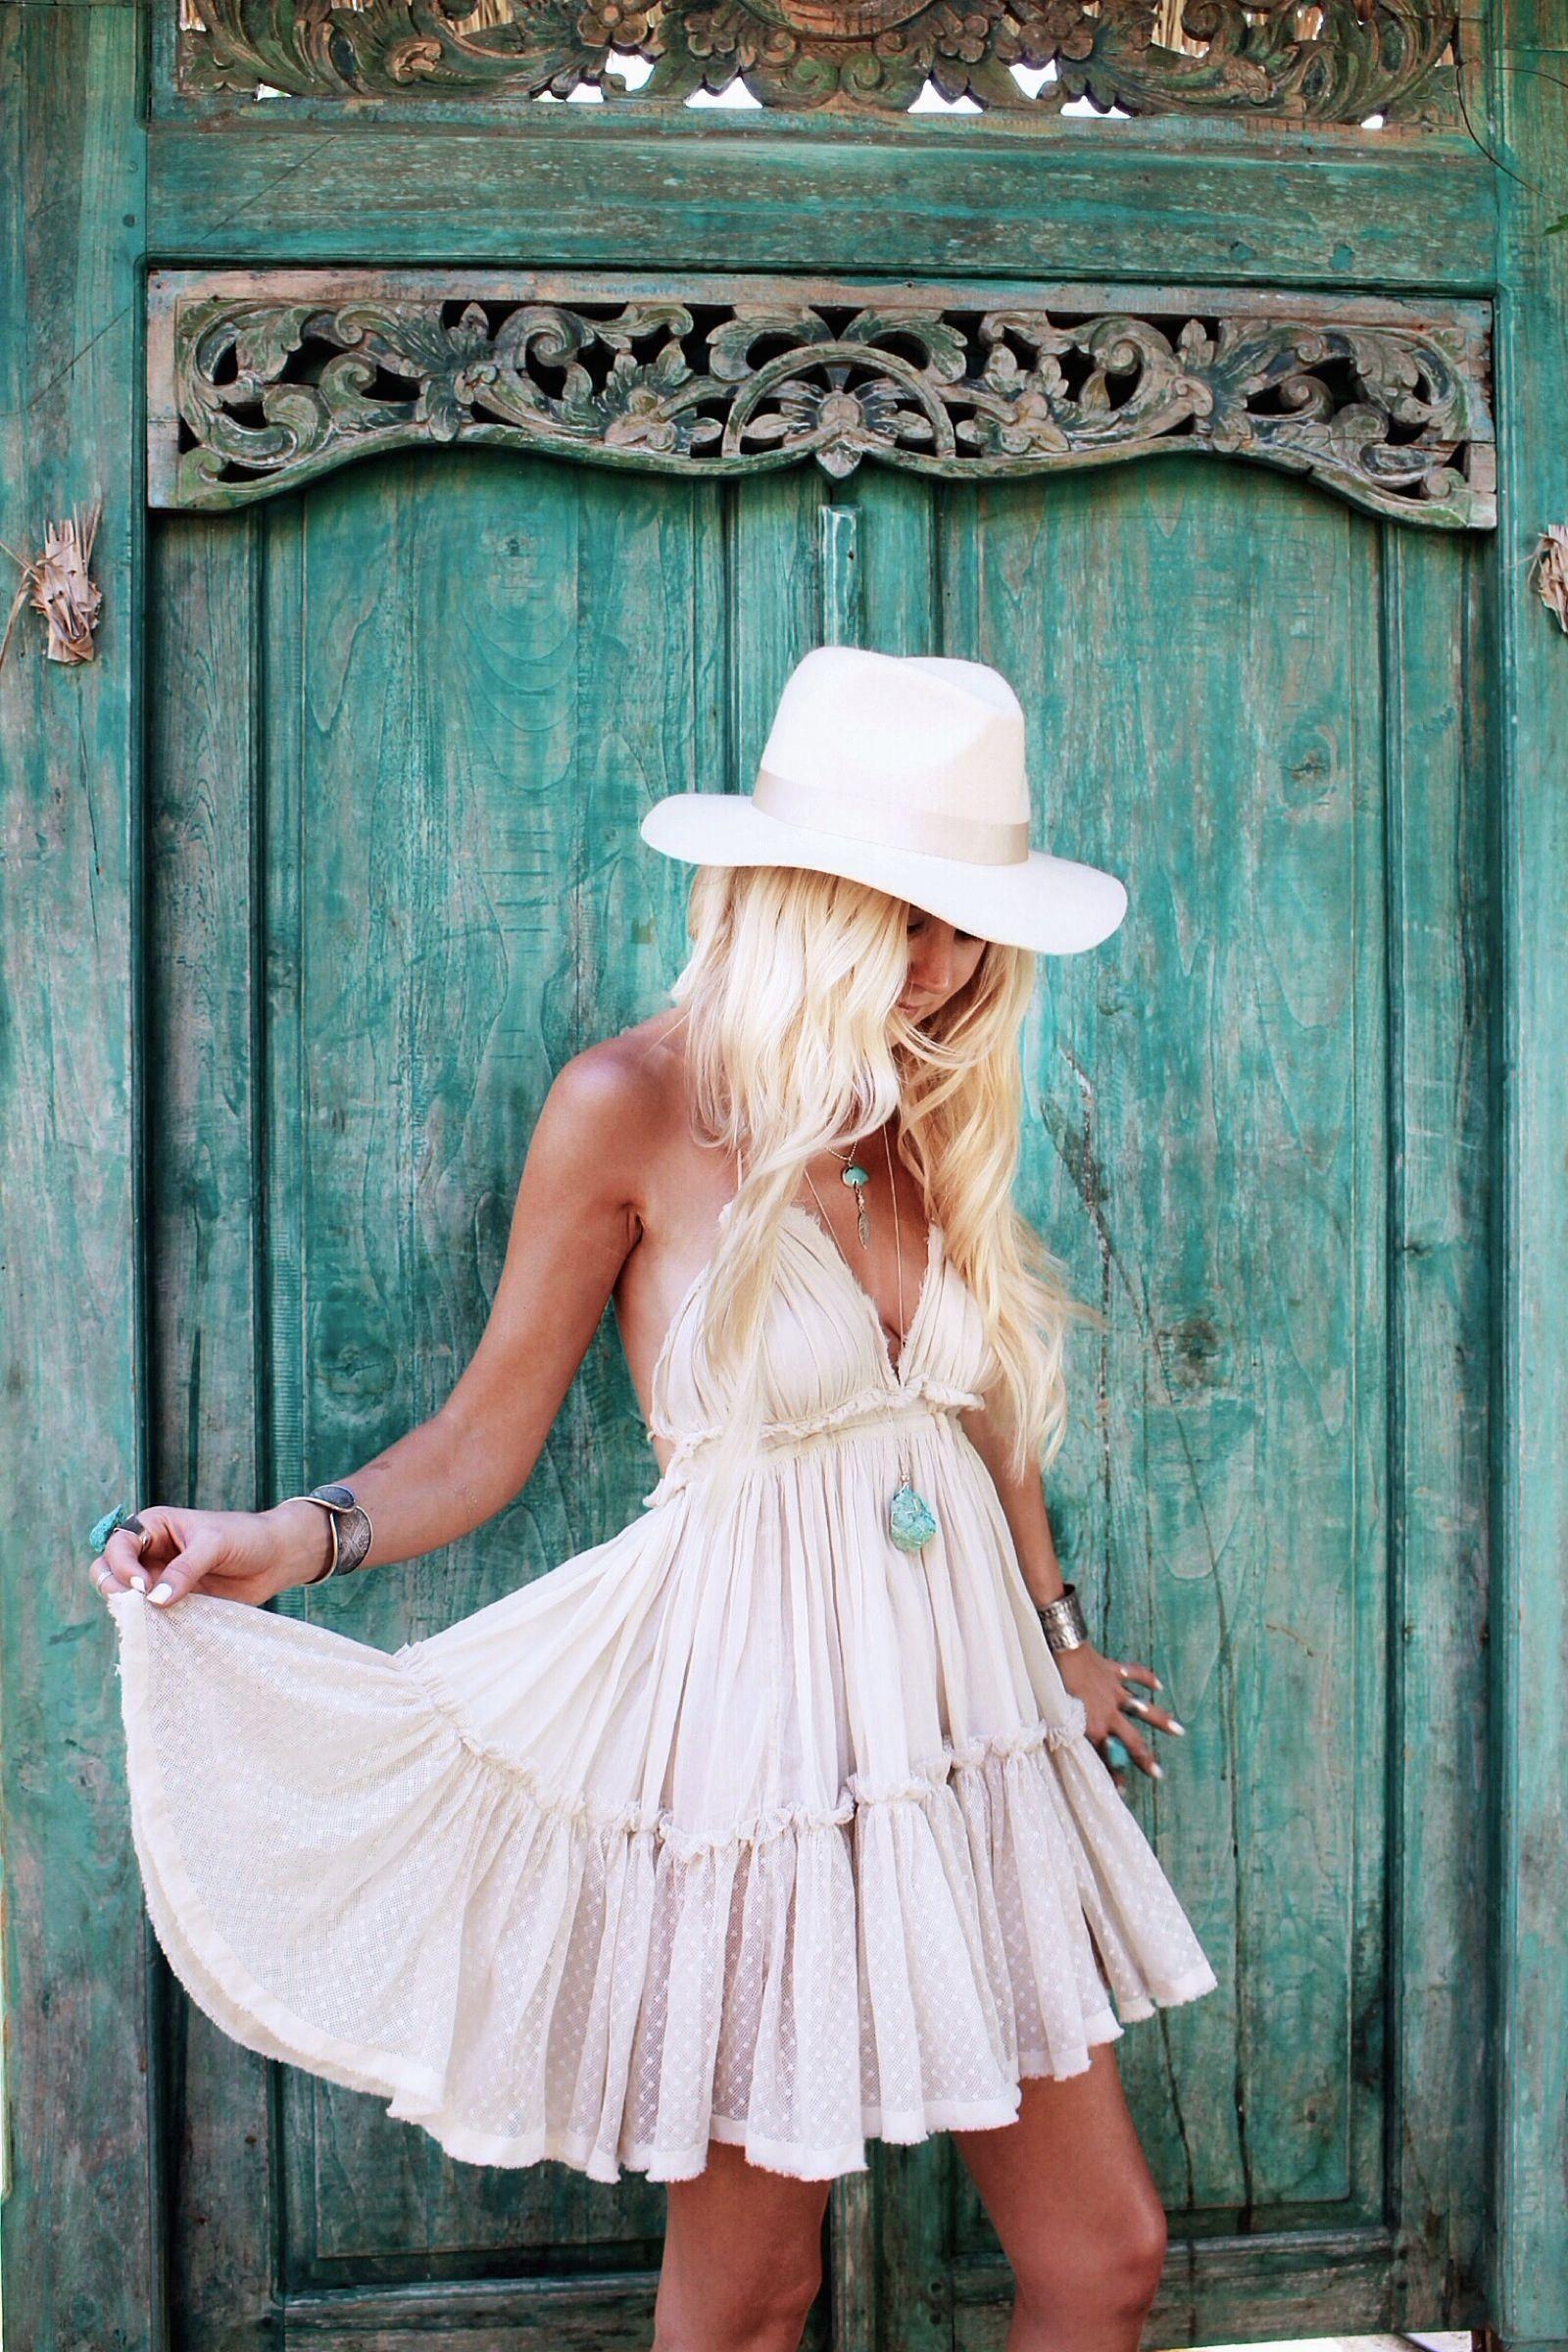 www.joevenuto.com Boho chic gypsy cowgirl look with modern hippie ...